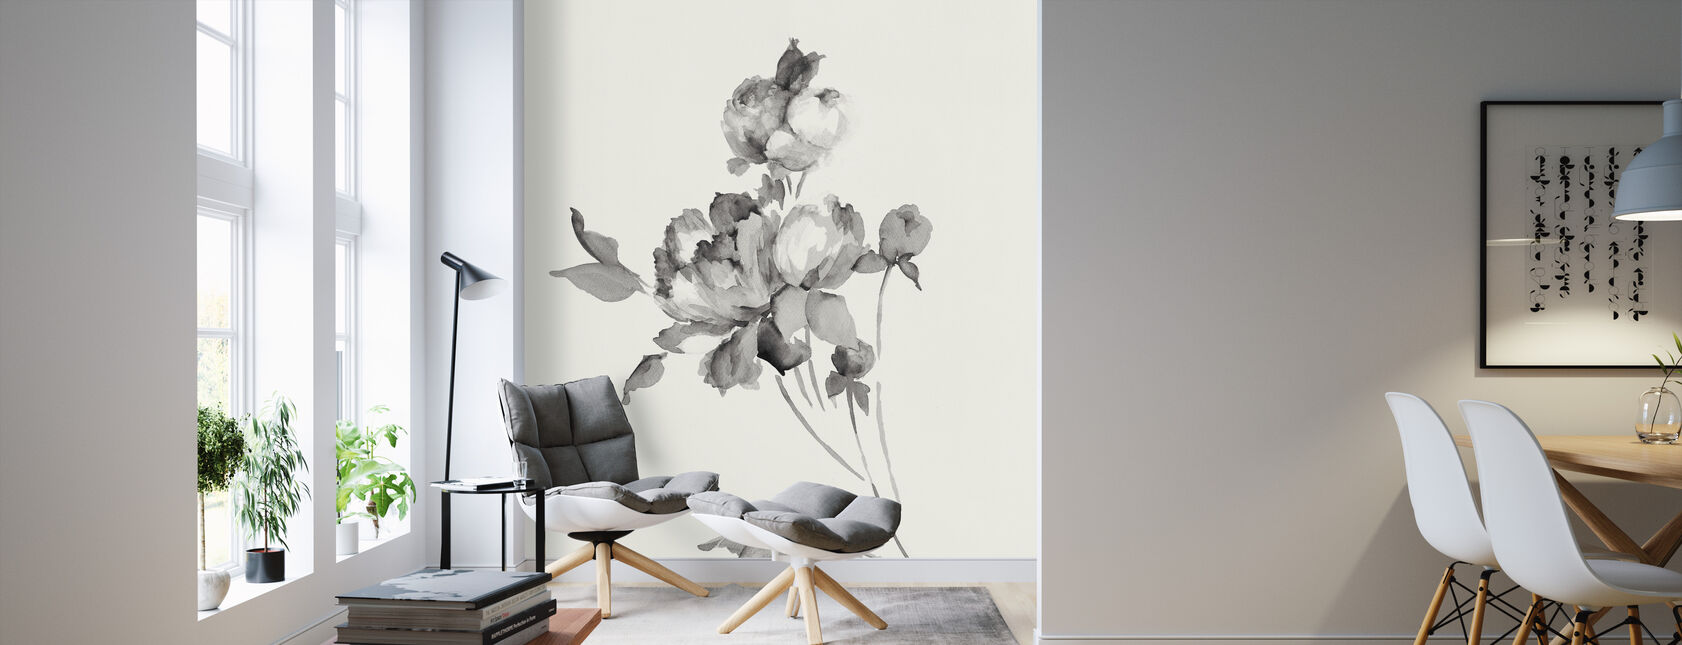 Peony Blossoms Gray - Wallpaper - Living Room